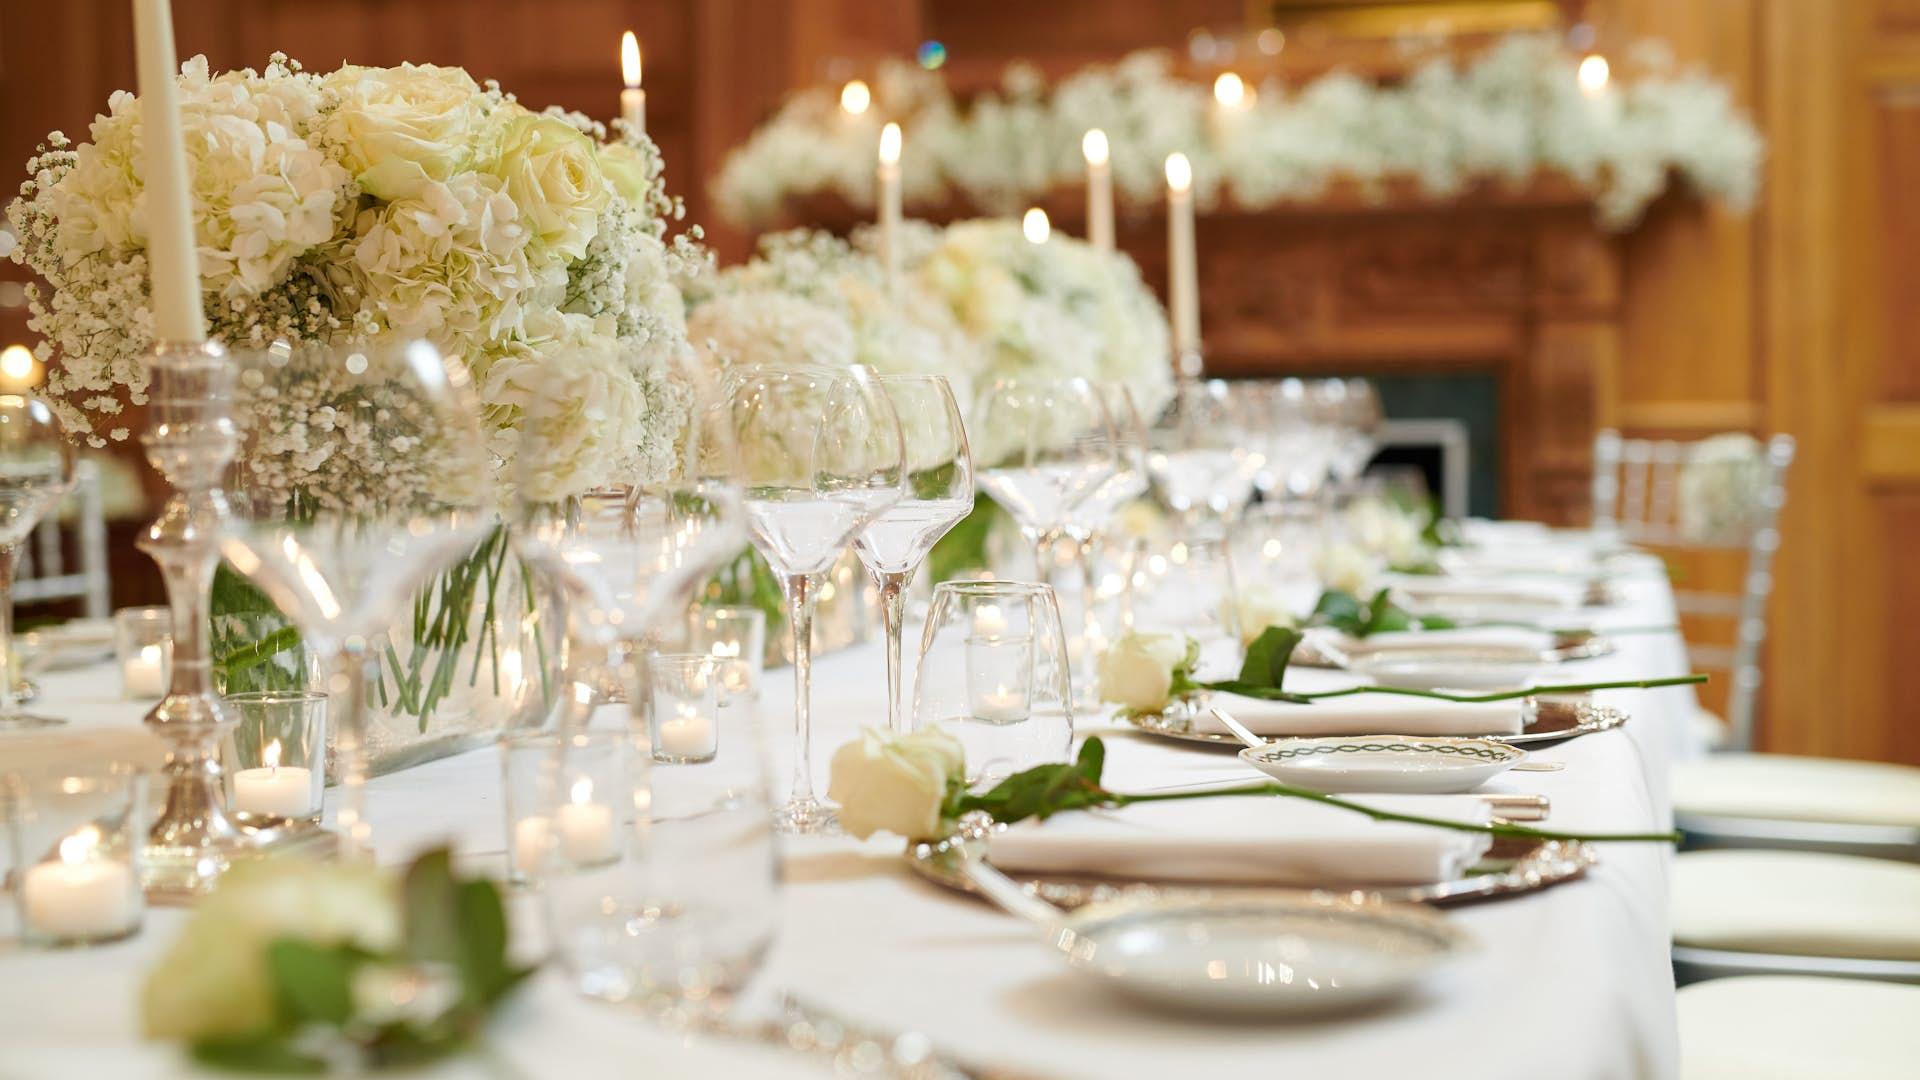 Windsor Suite | Weddings | The Milestone Hotel